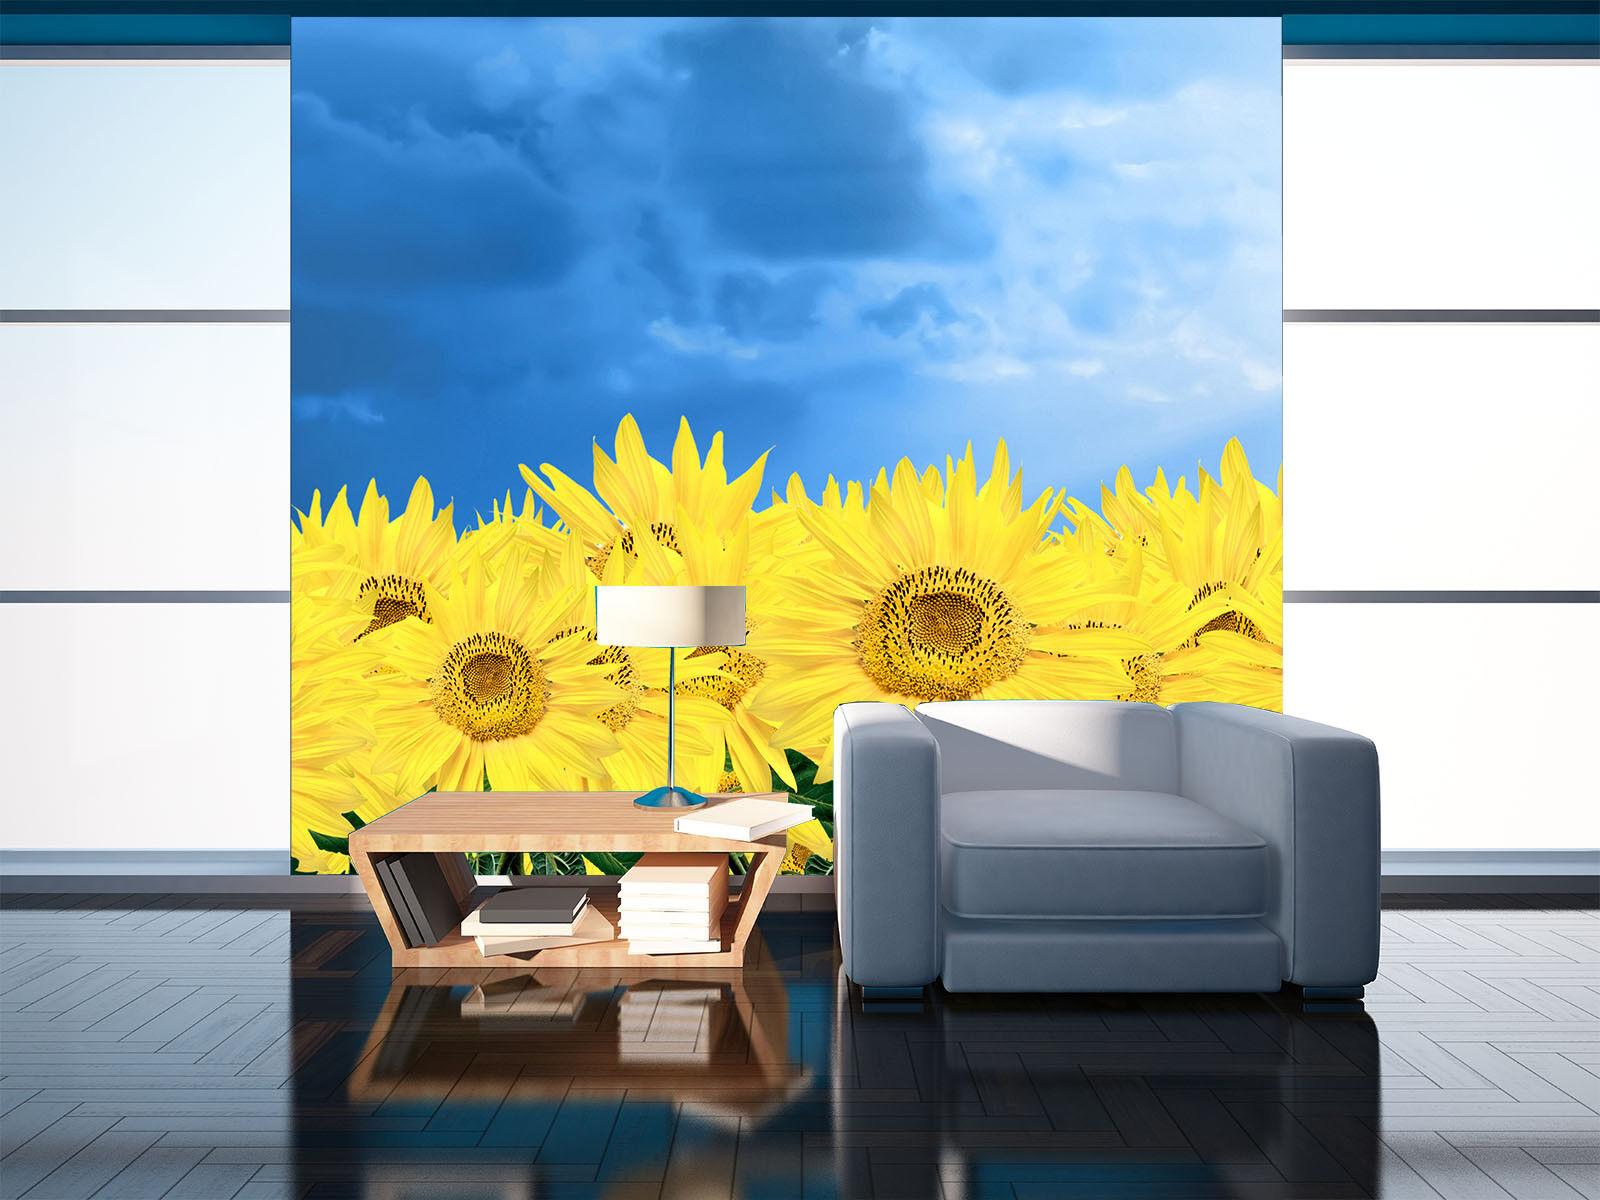 3D Sunflowers 554 Wallpaper Murals Wall Print Wallpaper Mural AJ WALL AU Kyra